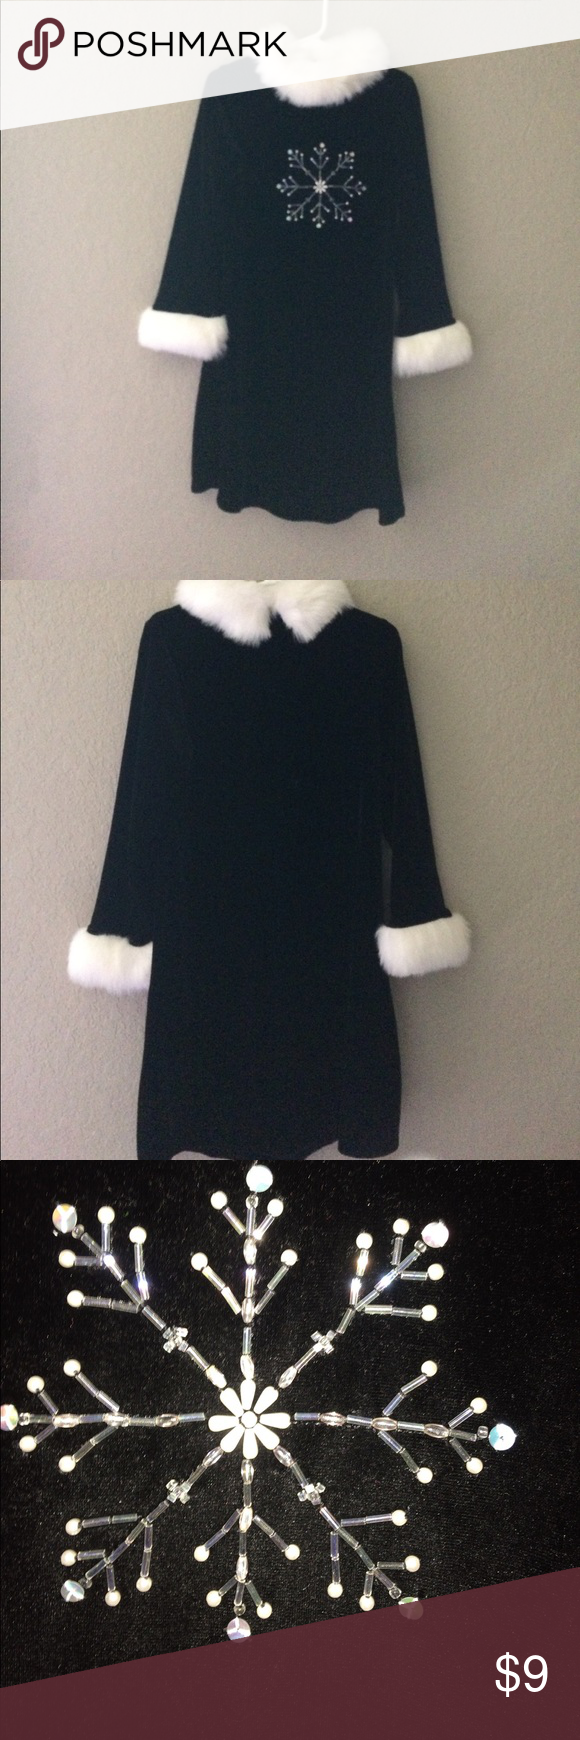 Black girls long sleeve black dress